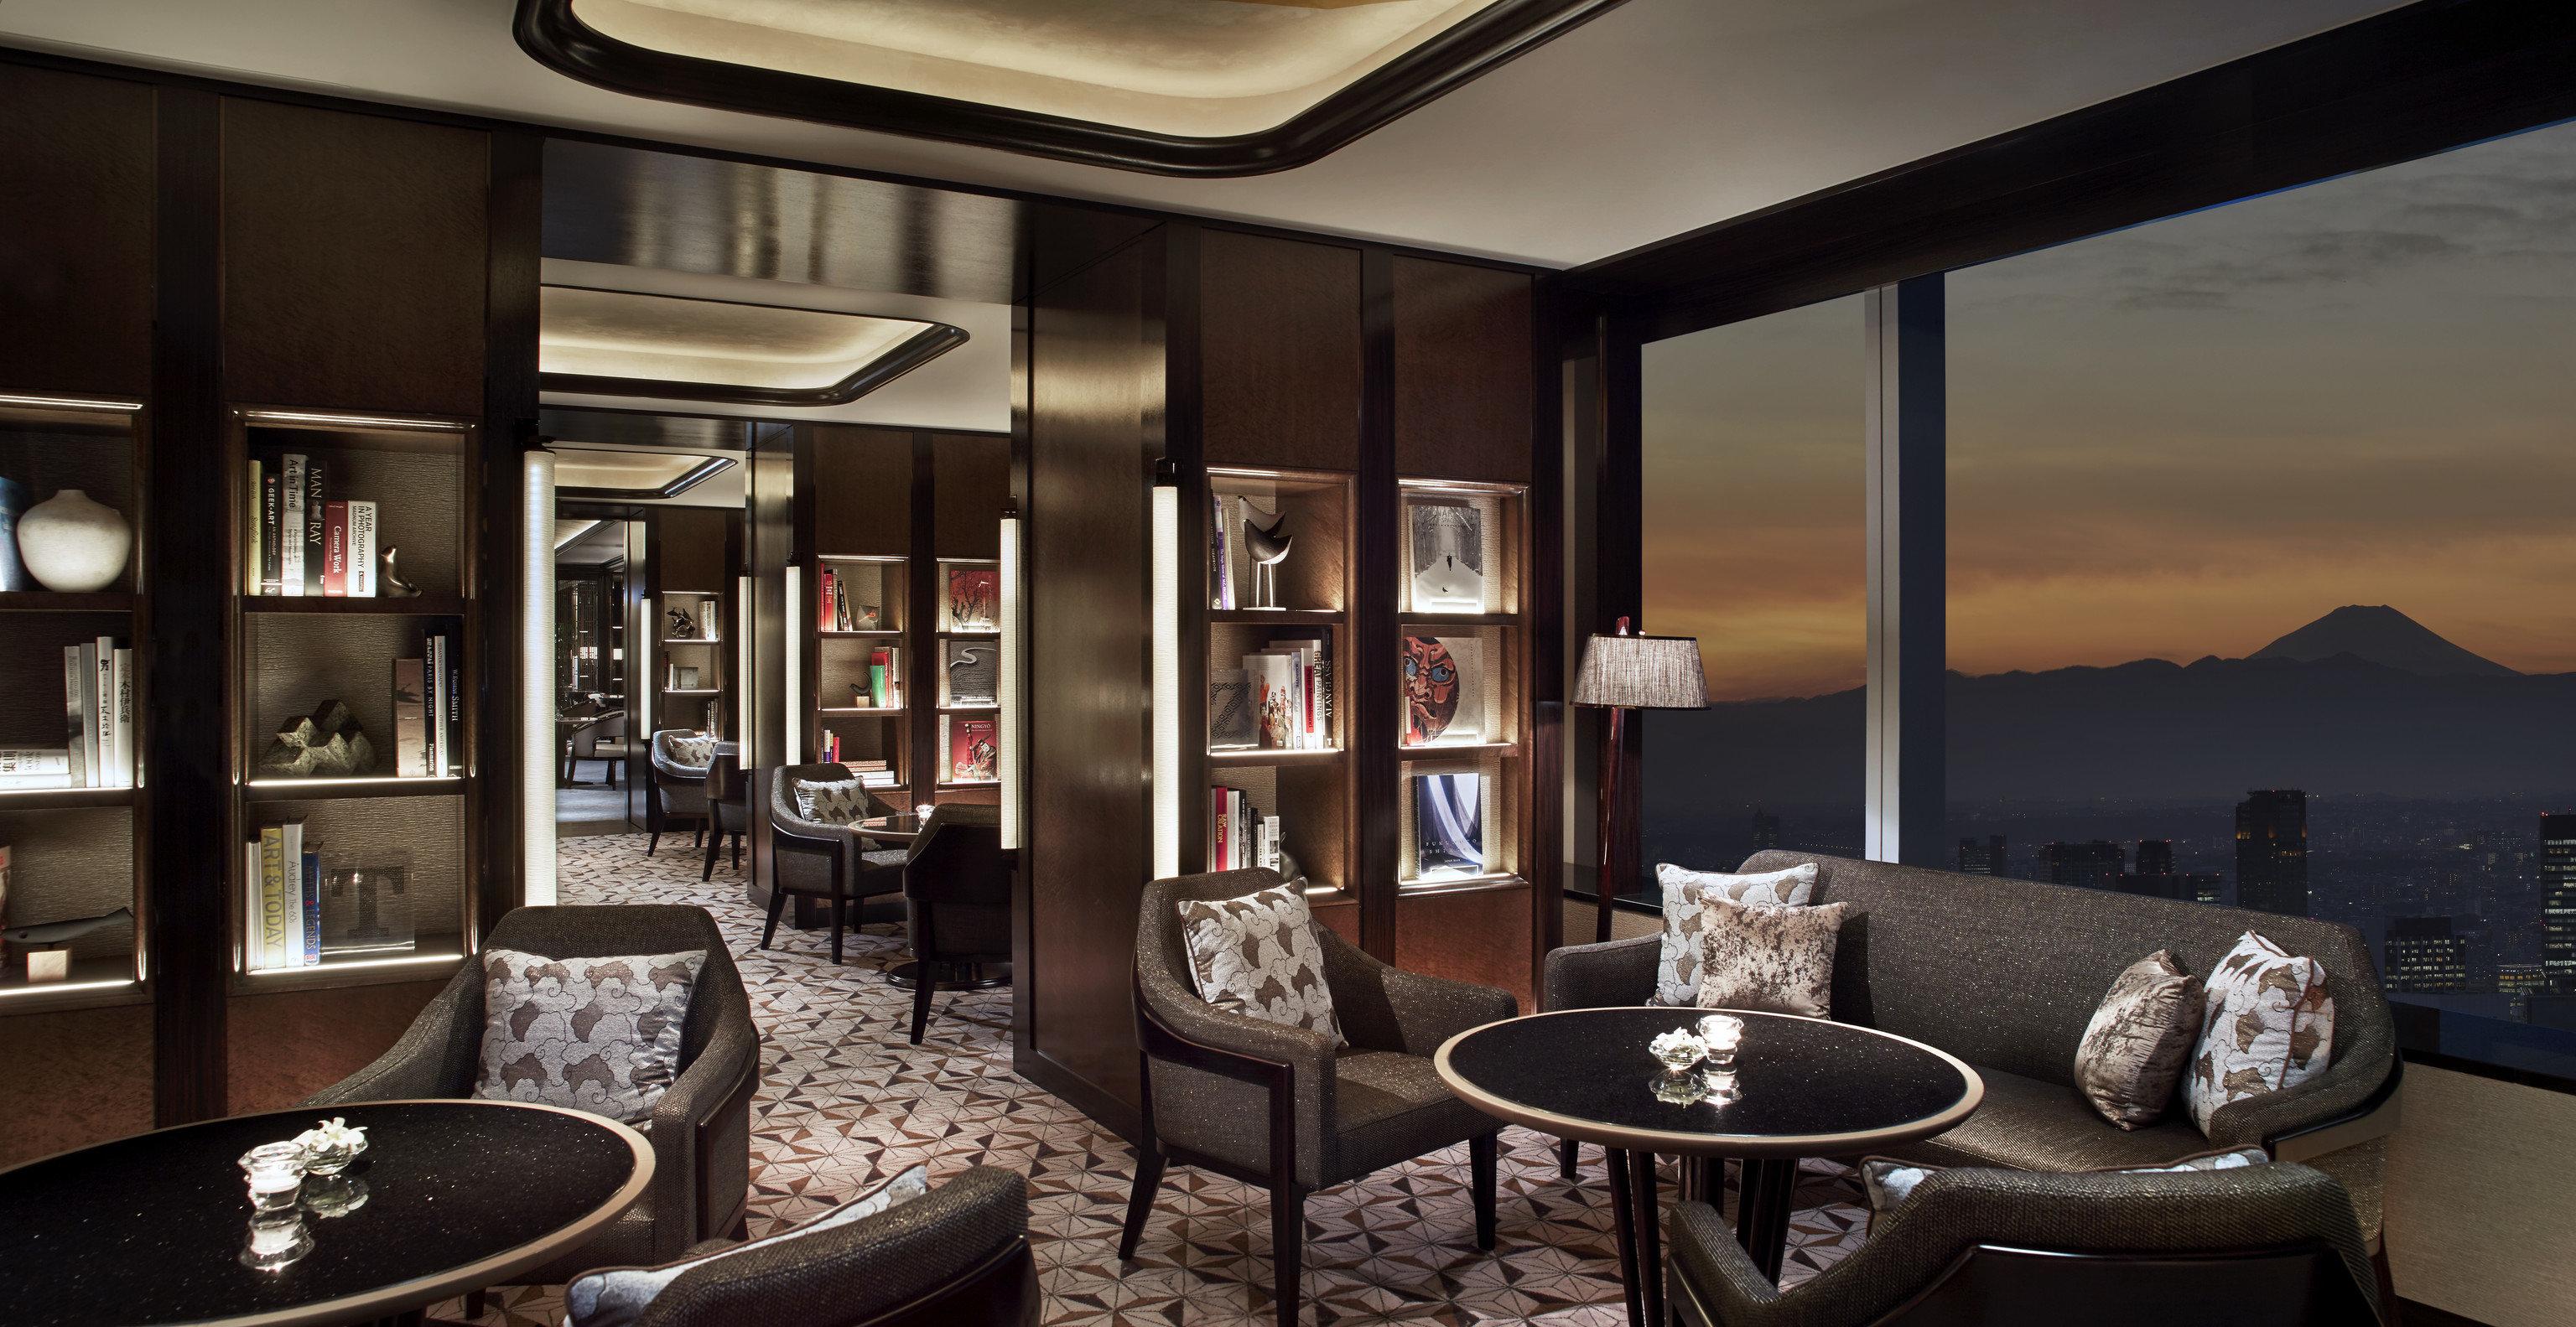 Hotels Japan Tokyo indoor room property living room home estate interior design condominium dining room Suite Design furniture area